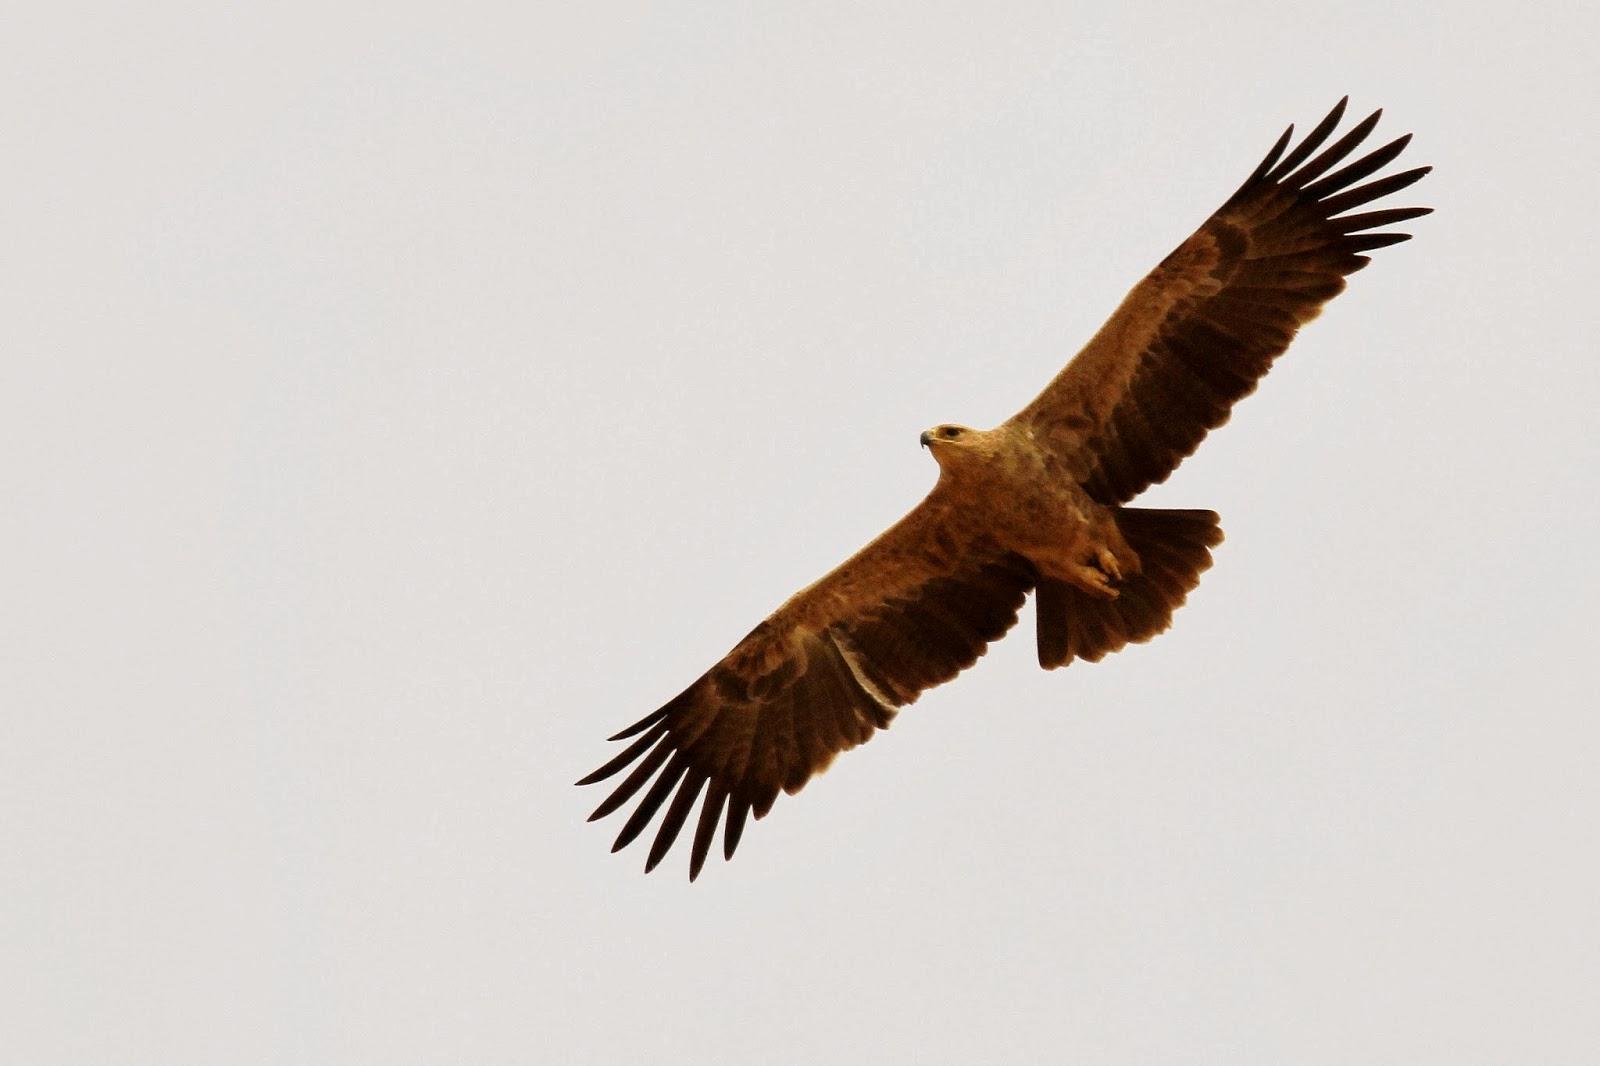 Tawny Eagle (Aquila rapax), northern Senegal, 26 Jan. 2014 (Frédéric Bacuez/Ornithondar).